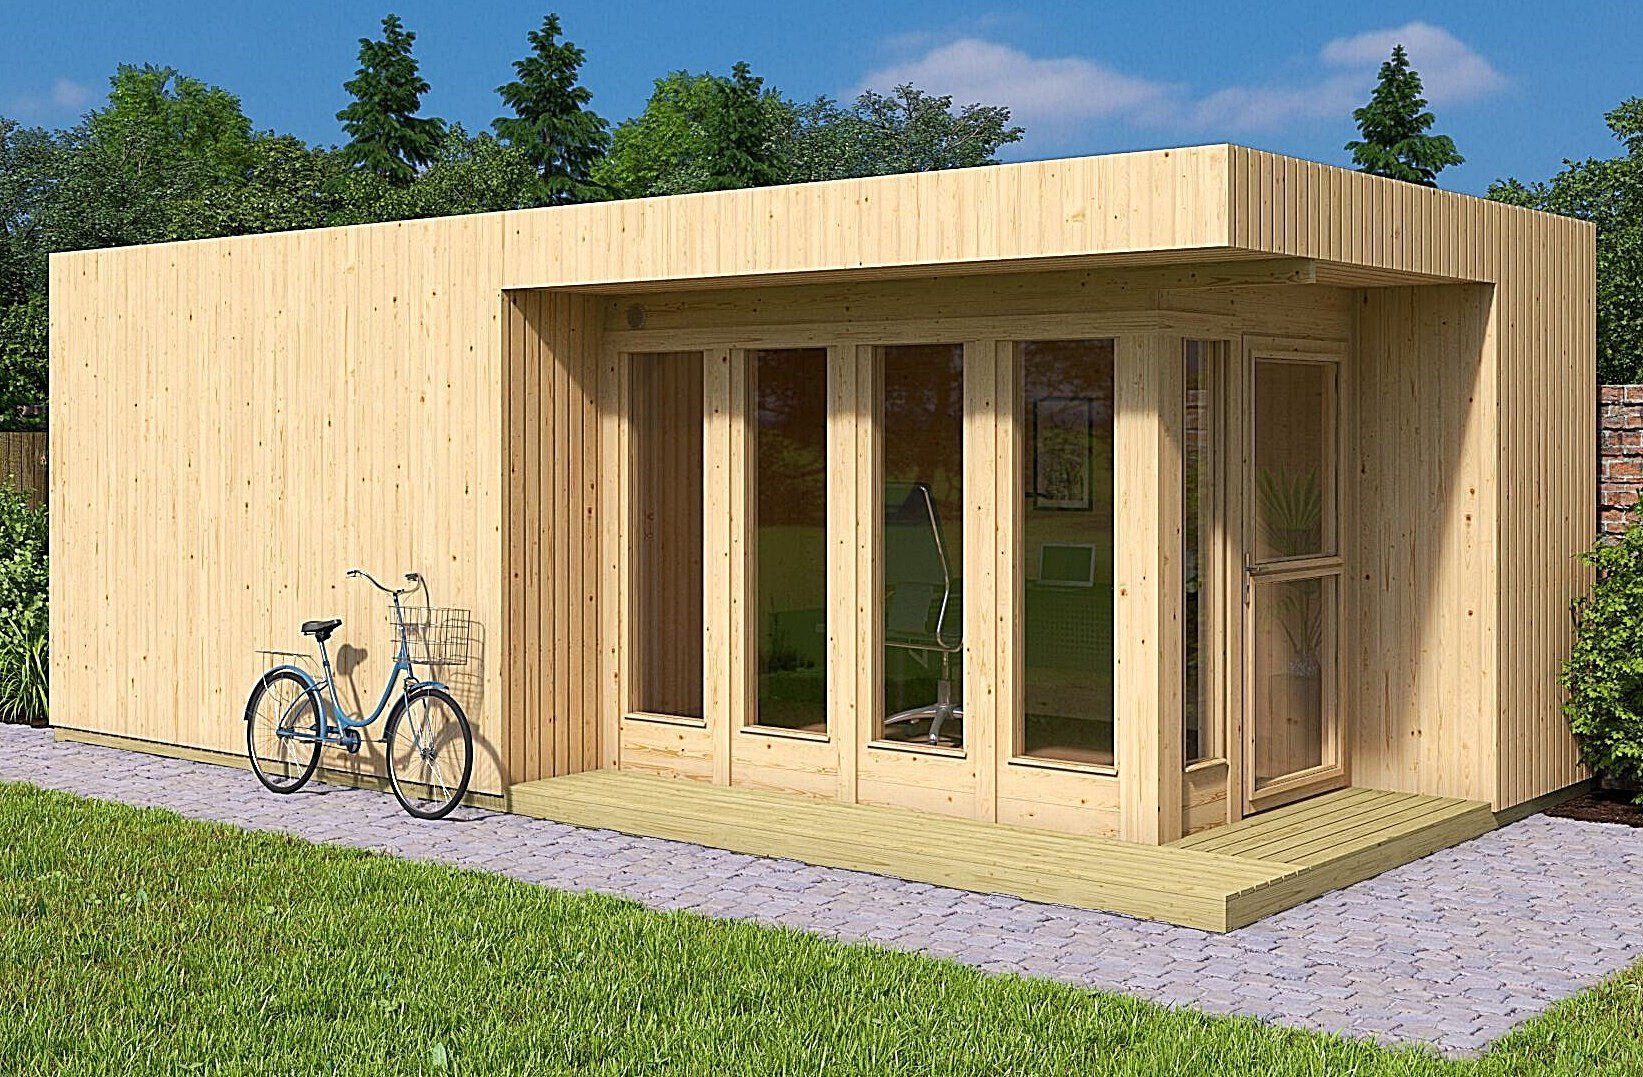 Allwood Arlanda XXL 273 SQF Garden House Kit Tiny